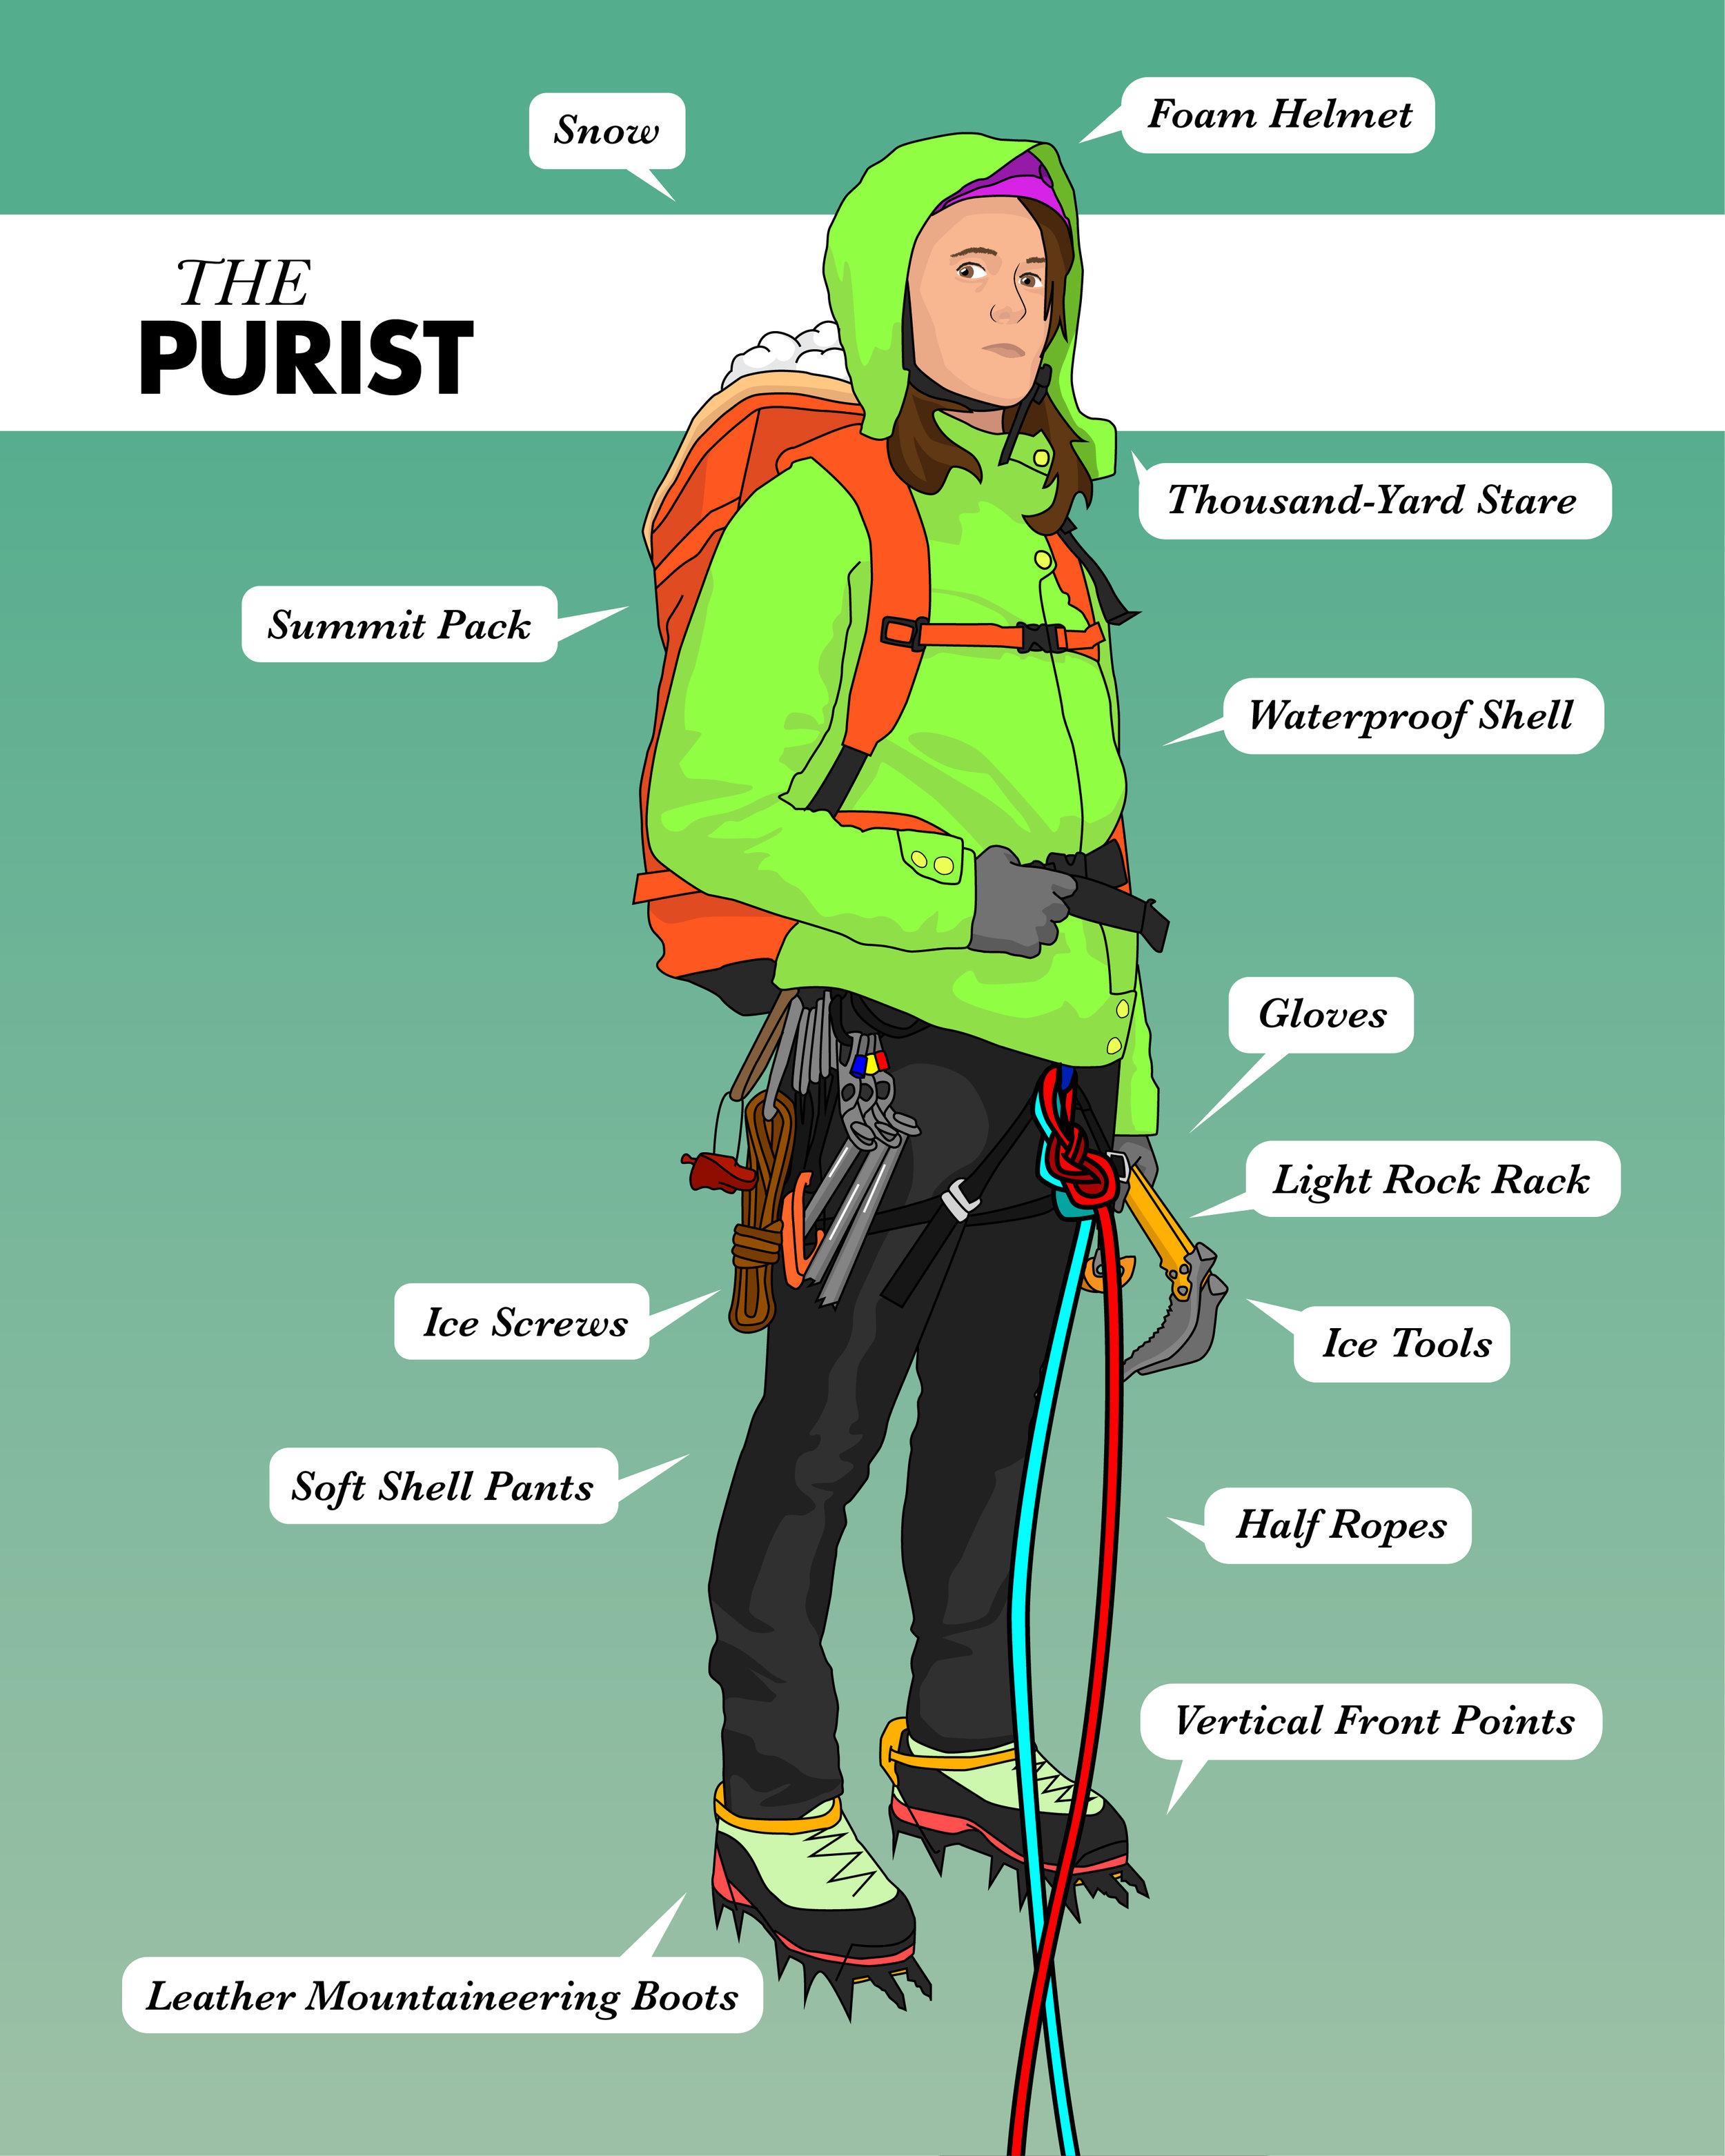 Solo-Purist-01-01.jpg